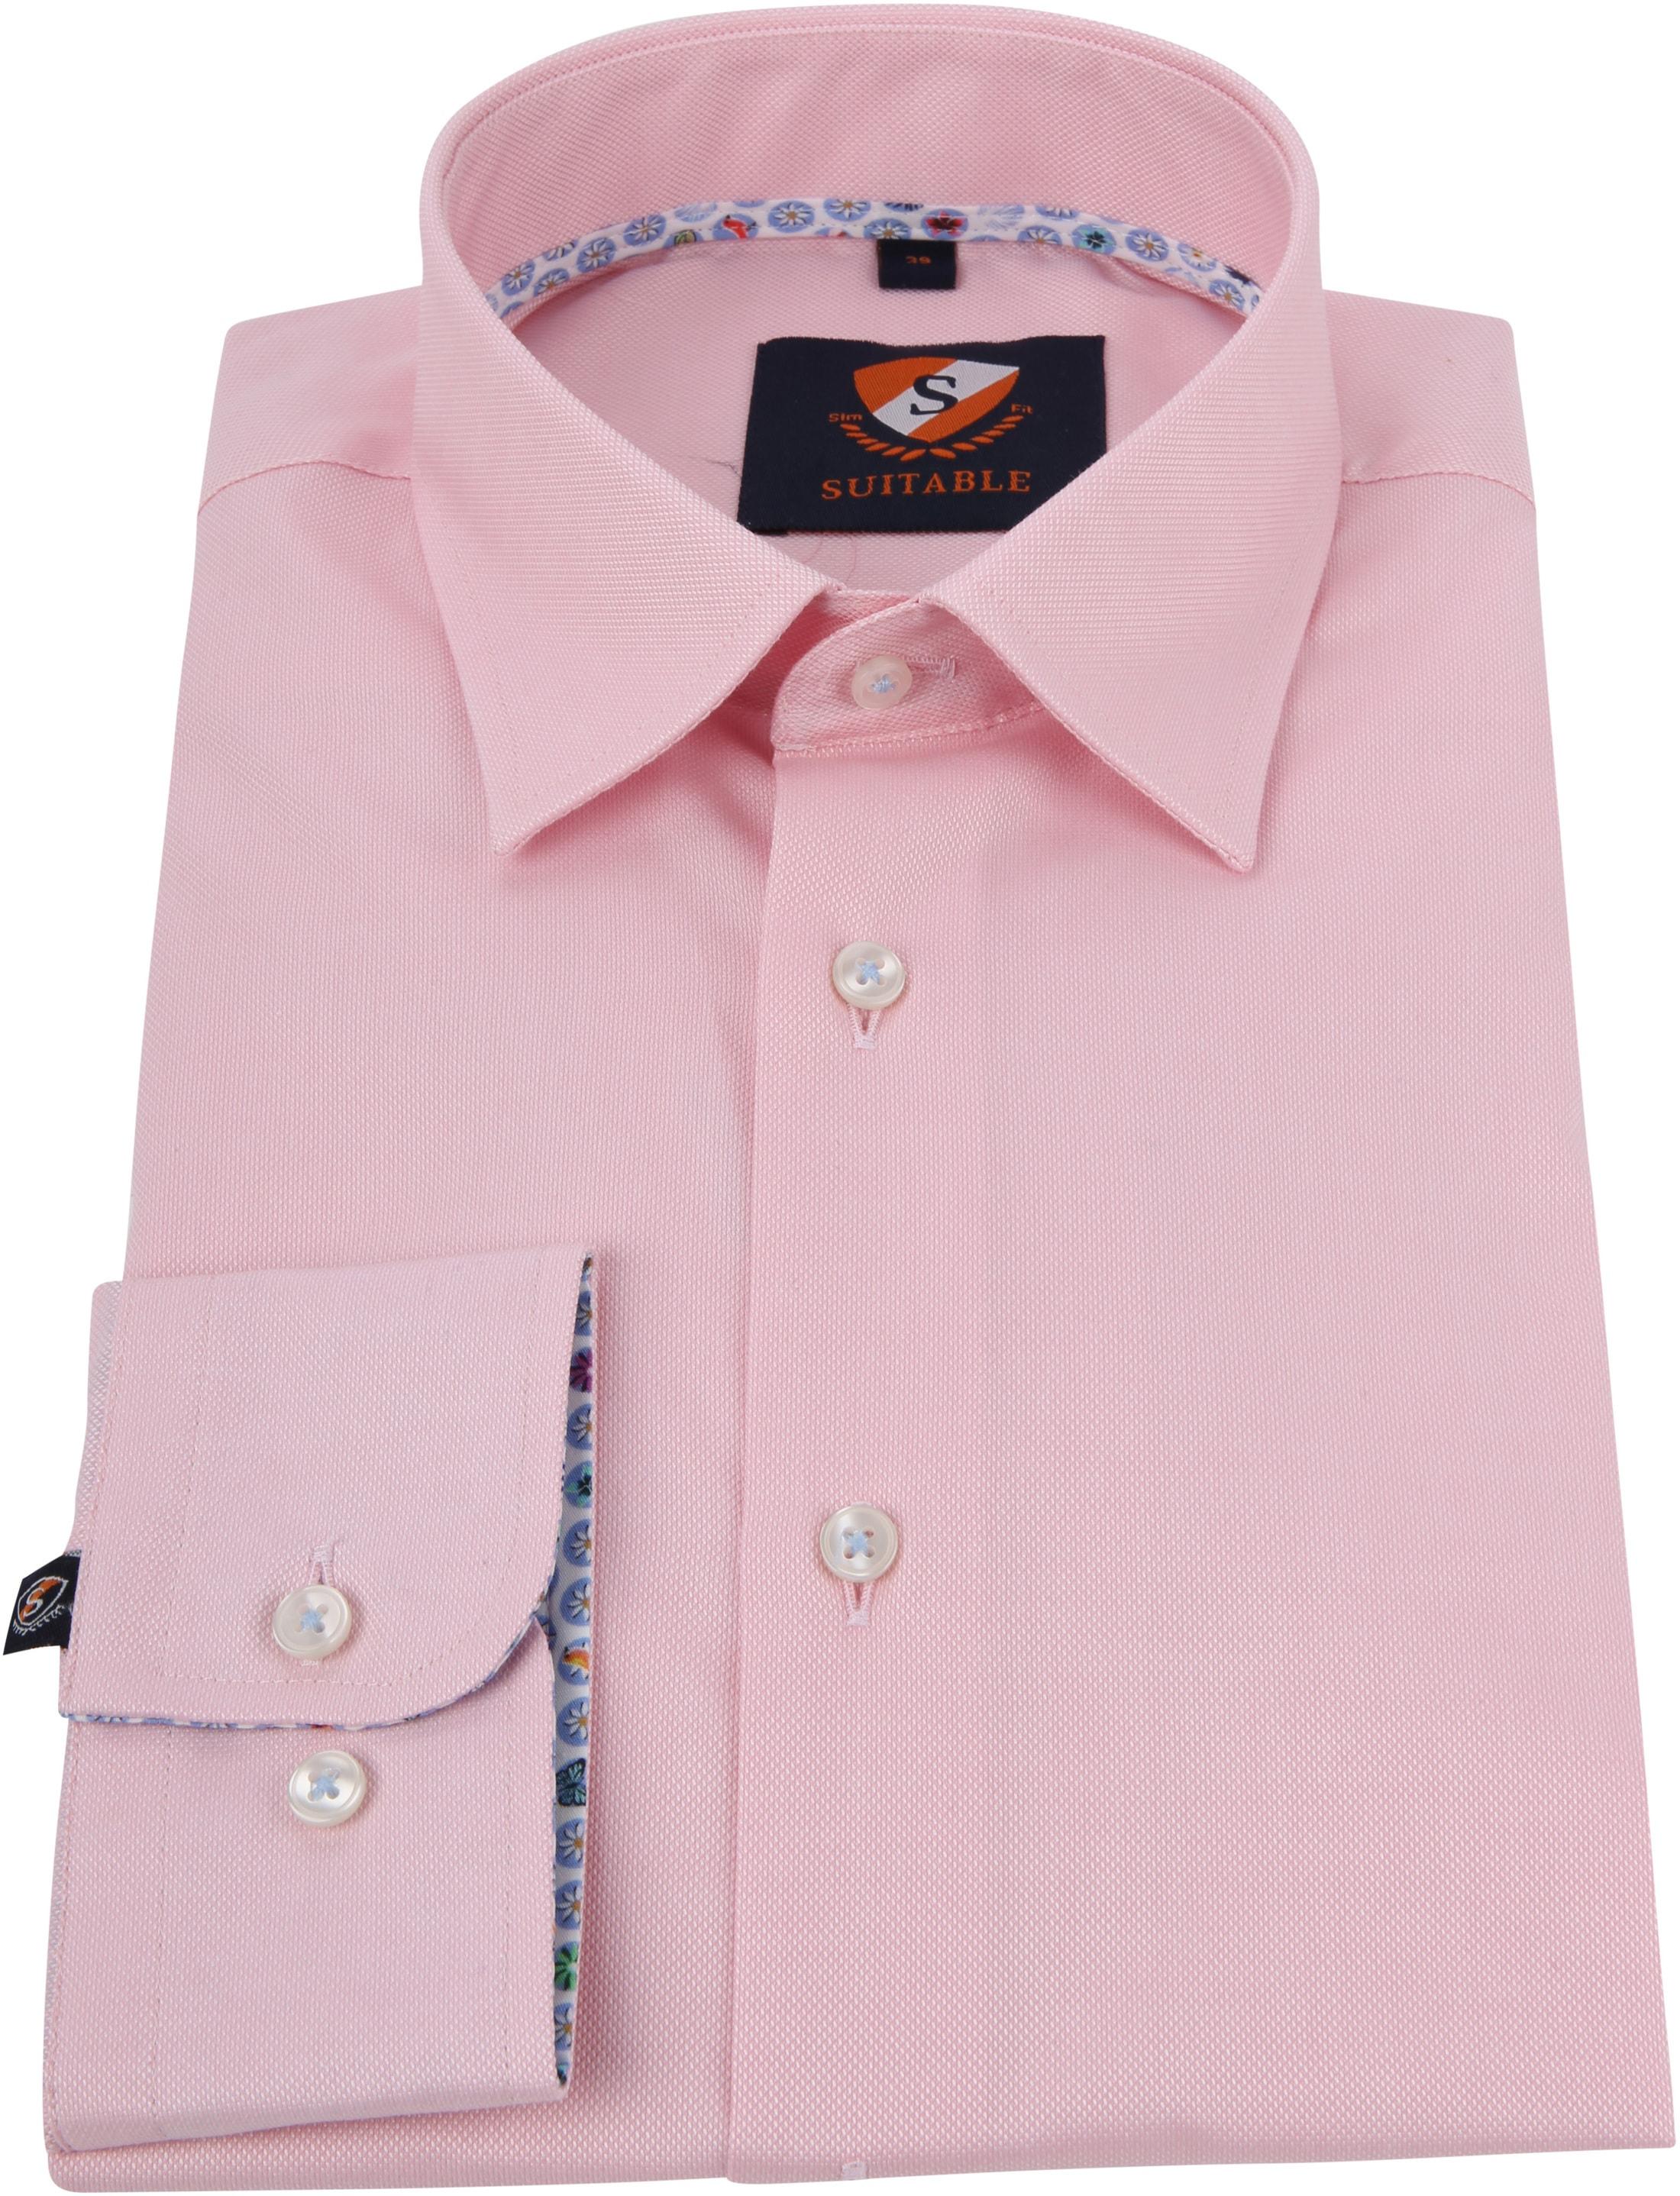 Suitable Shirt HBD Pink foto 2